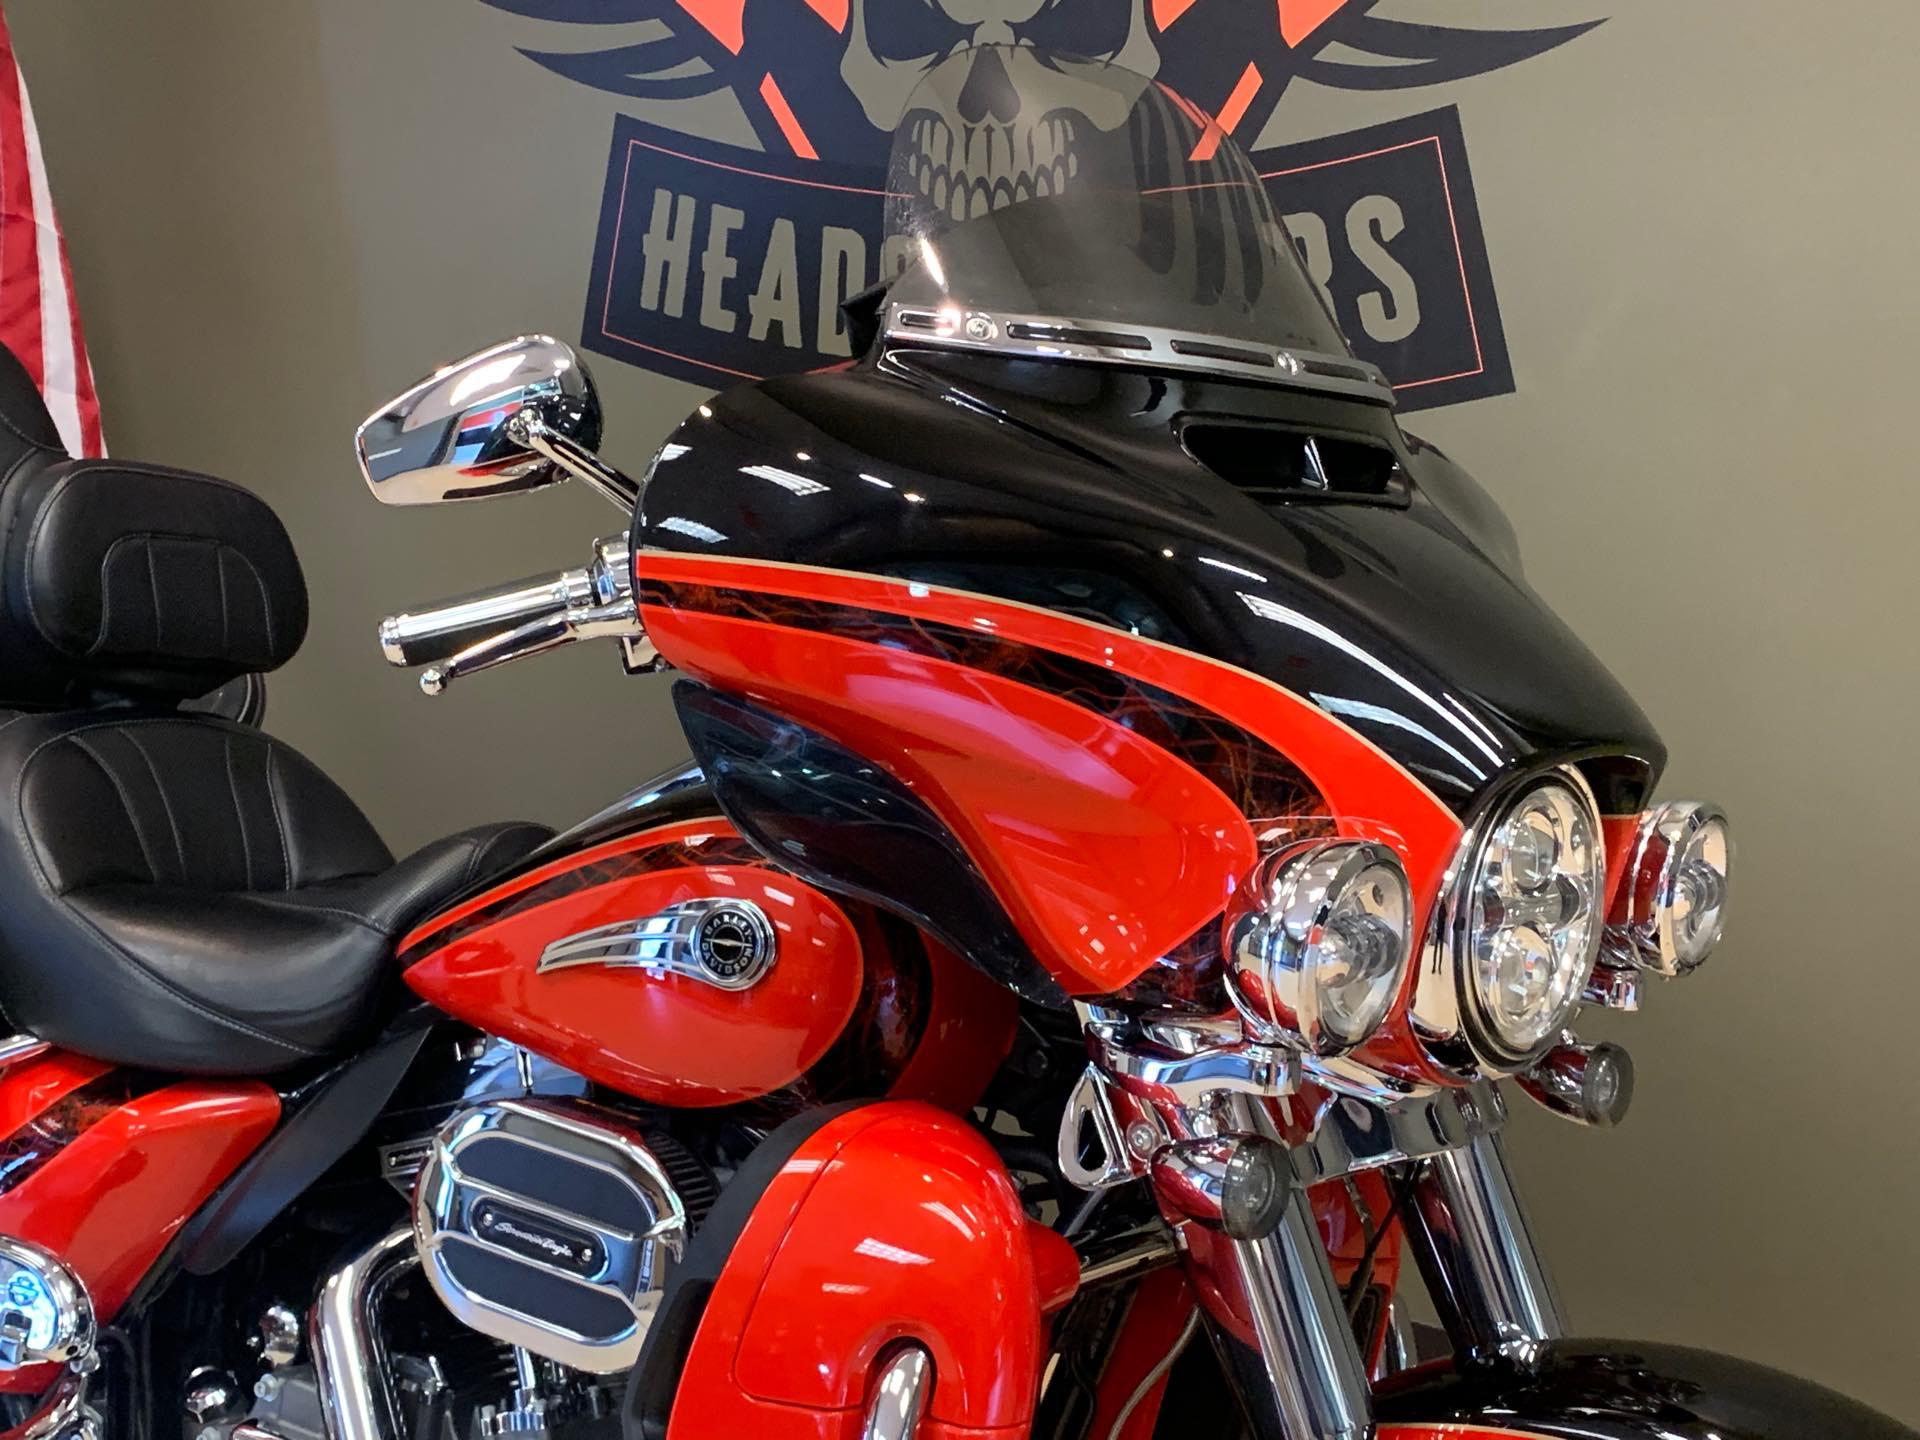 2016 Harley-Davidson Electra Glide CVO Limited at Loess Hills Harley-Davidson